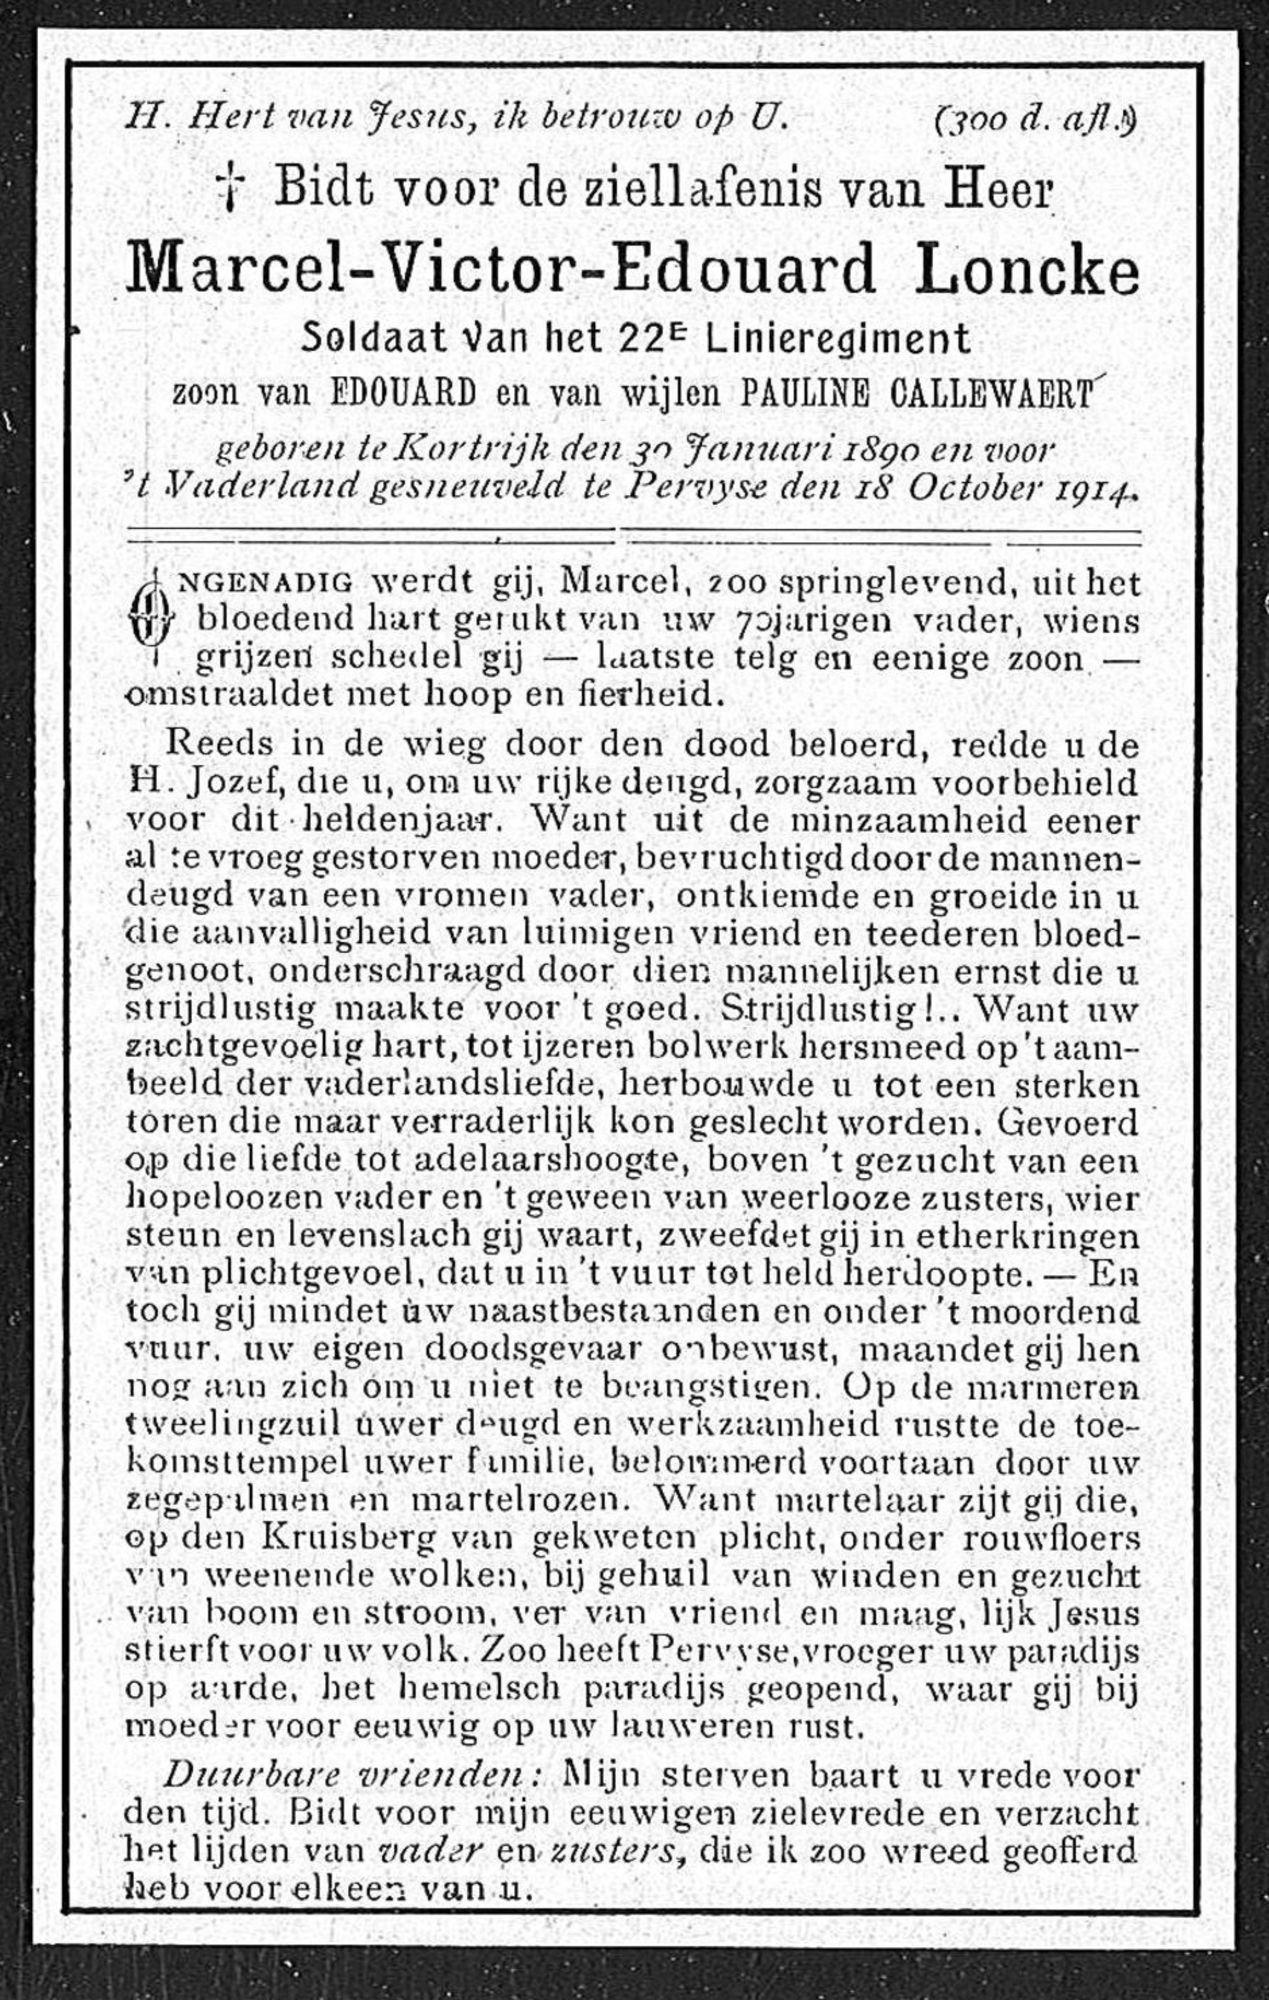 Marcel-Victor-Edouard Loncke